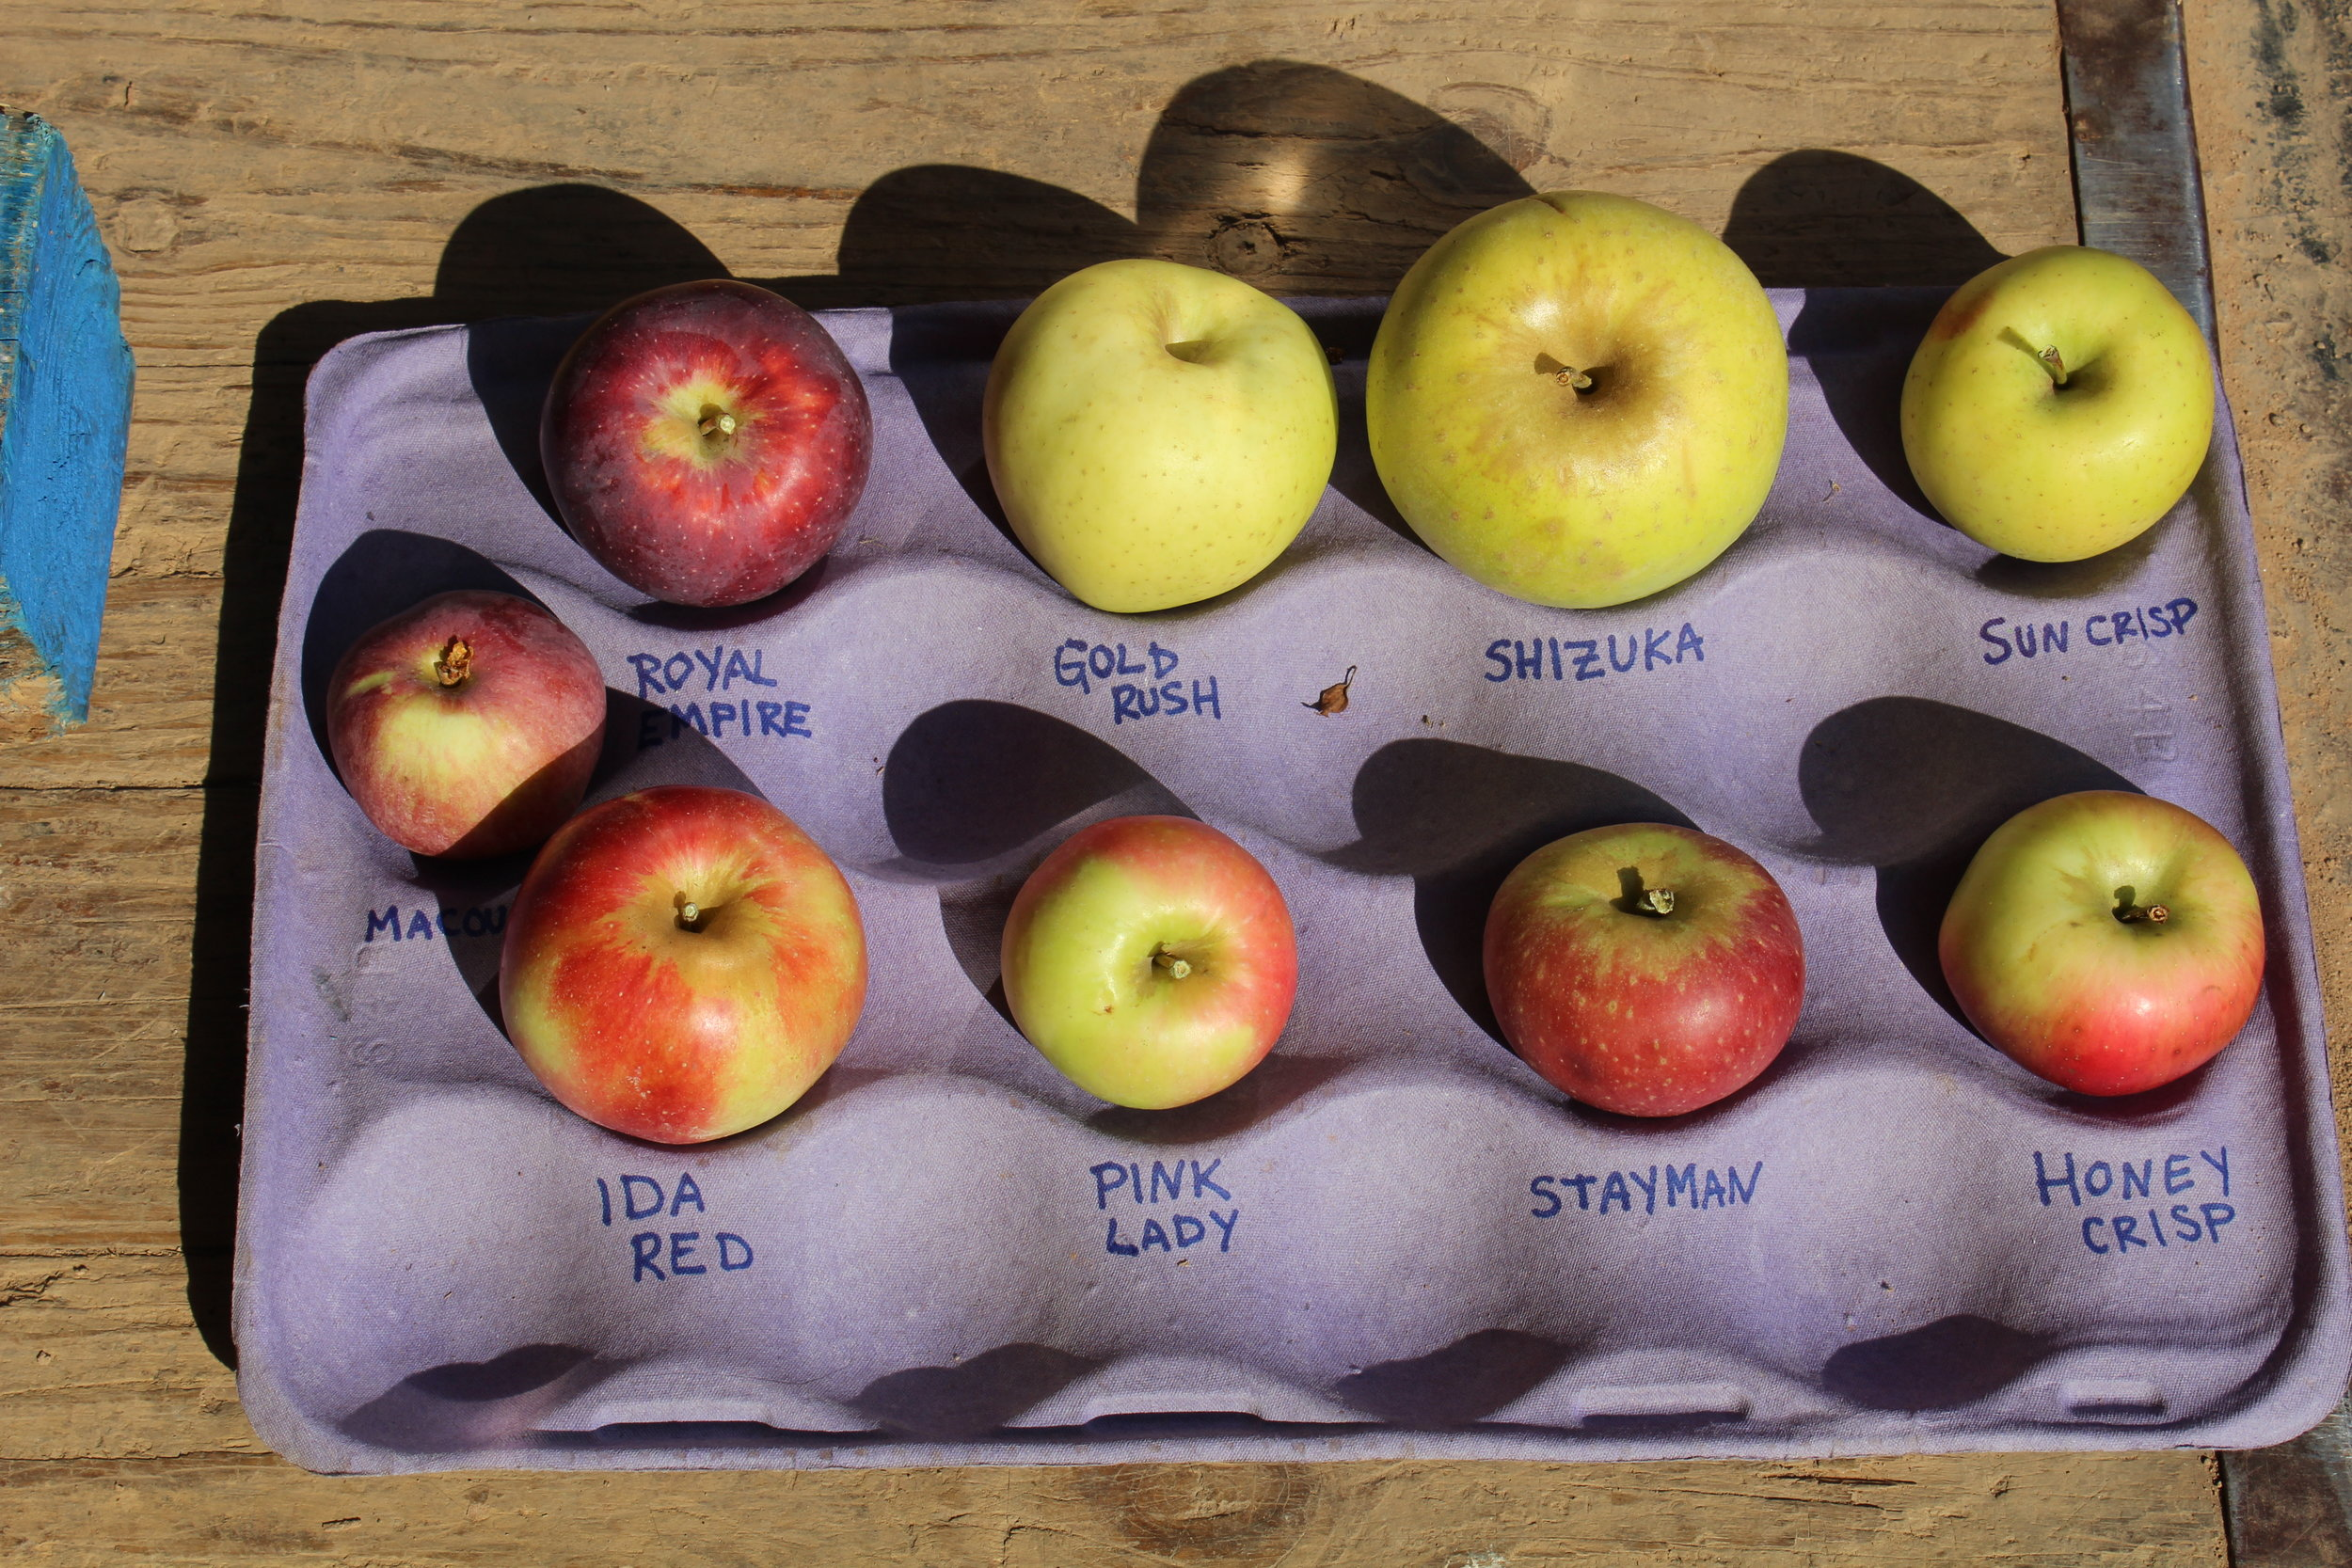 Adams County Apples